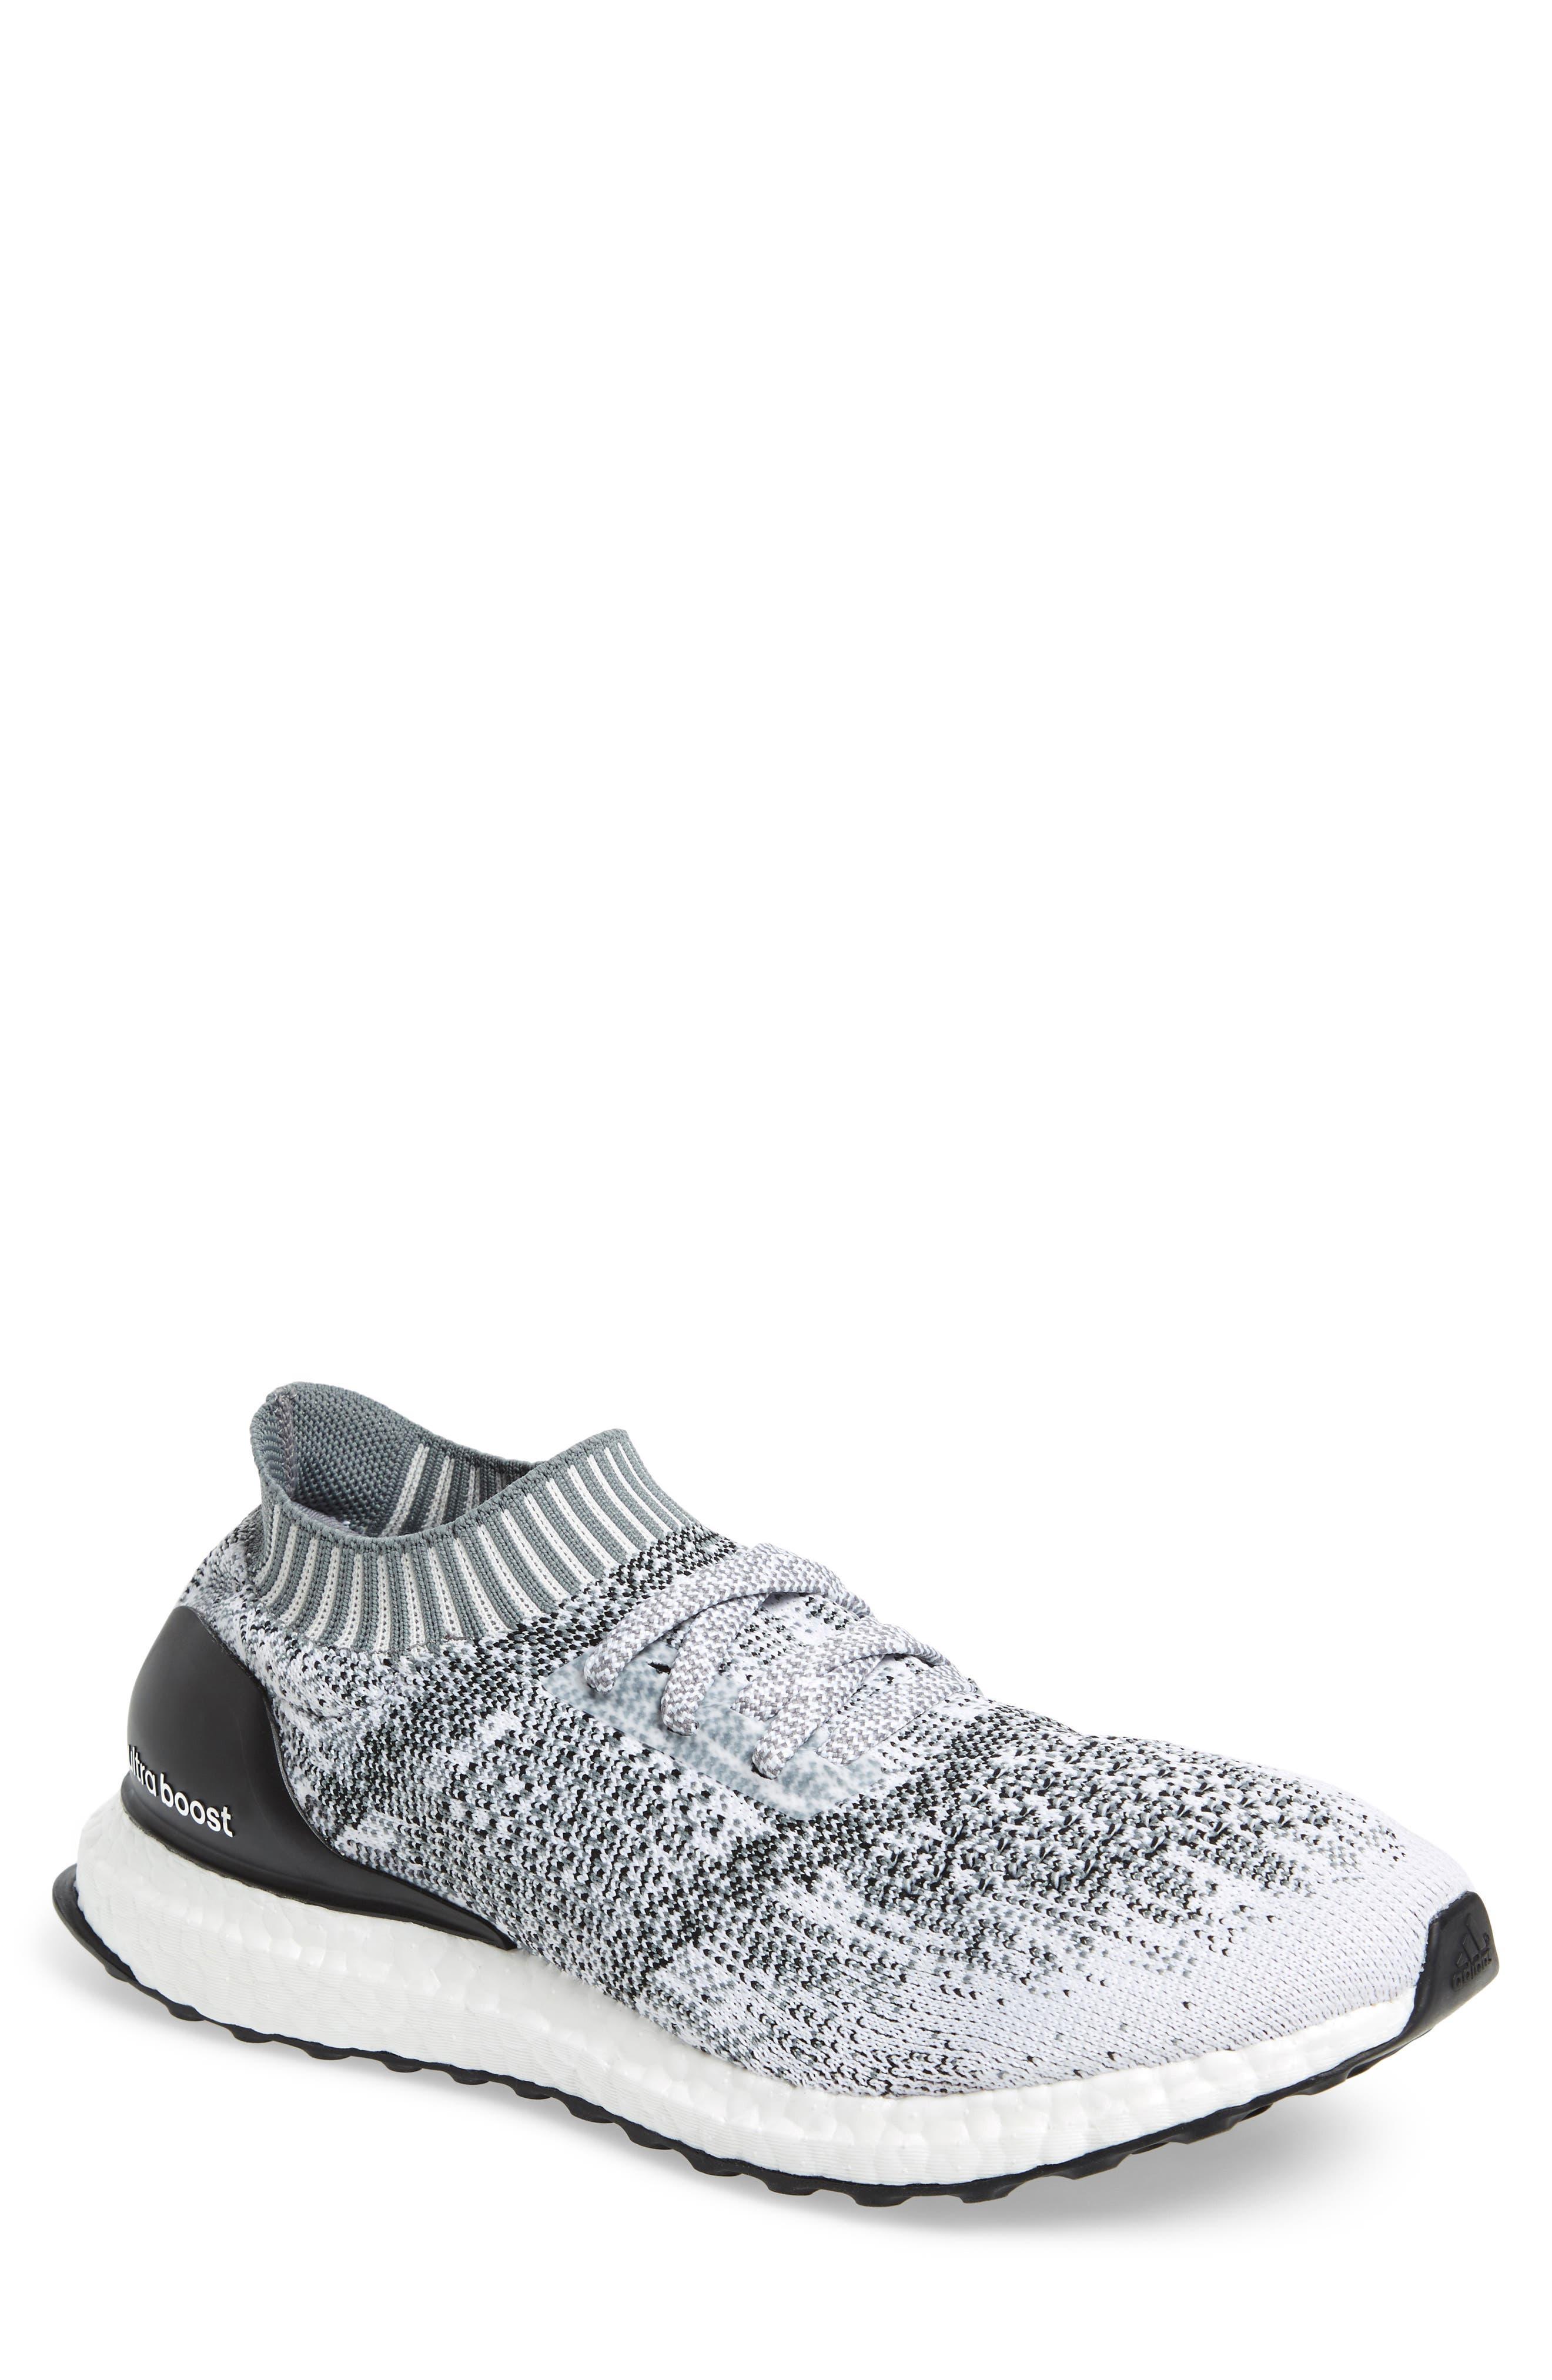 adidas \u0027UltraBOOST Uncaged\u0027 Running Shoe (Men)